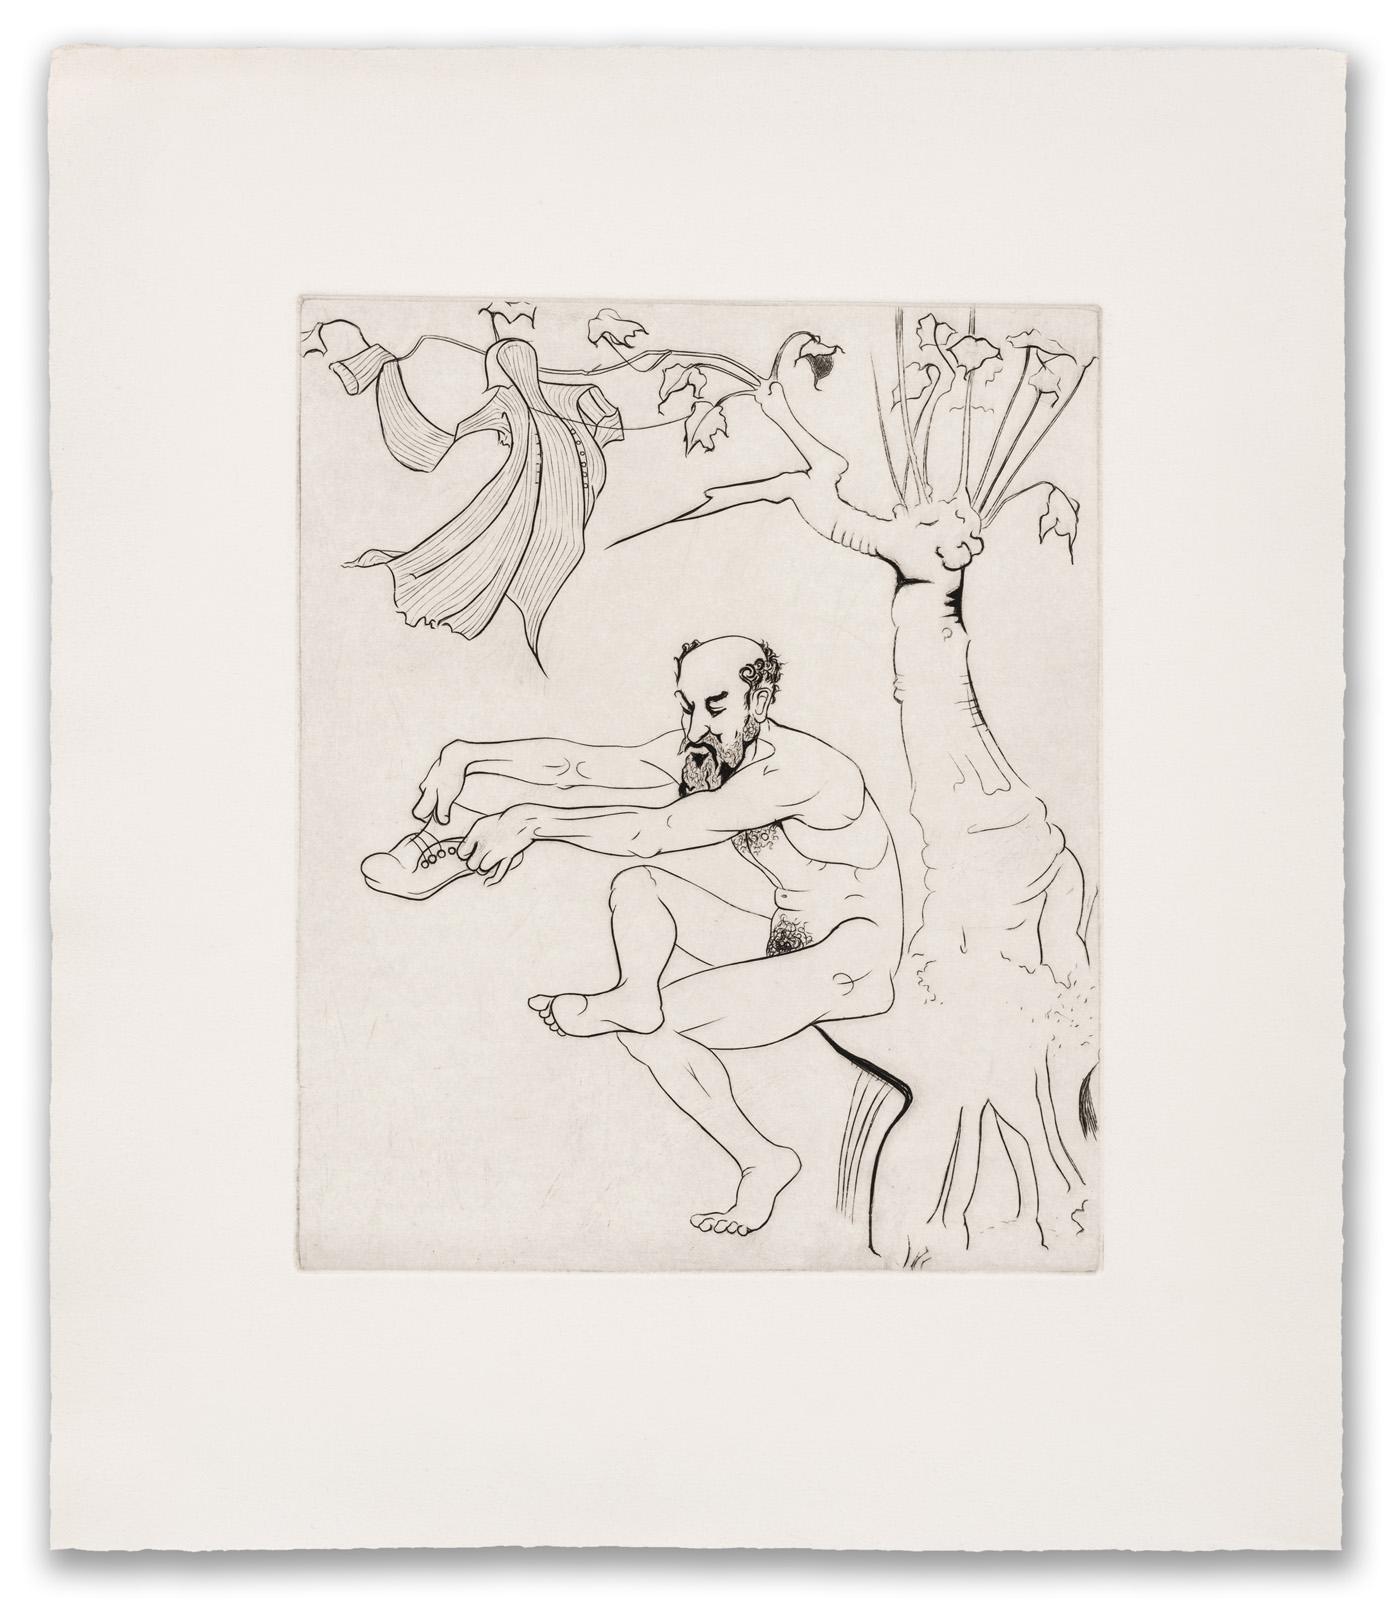 Francis West, (British 1936-2015), Jonah Returned, c.1979 (2017 Edition).